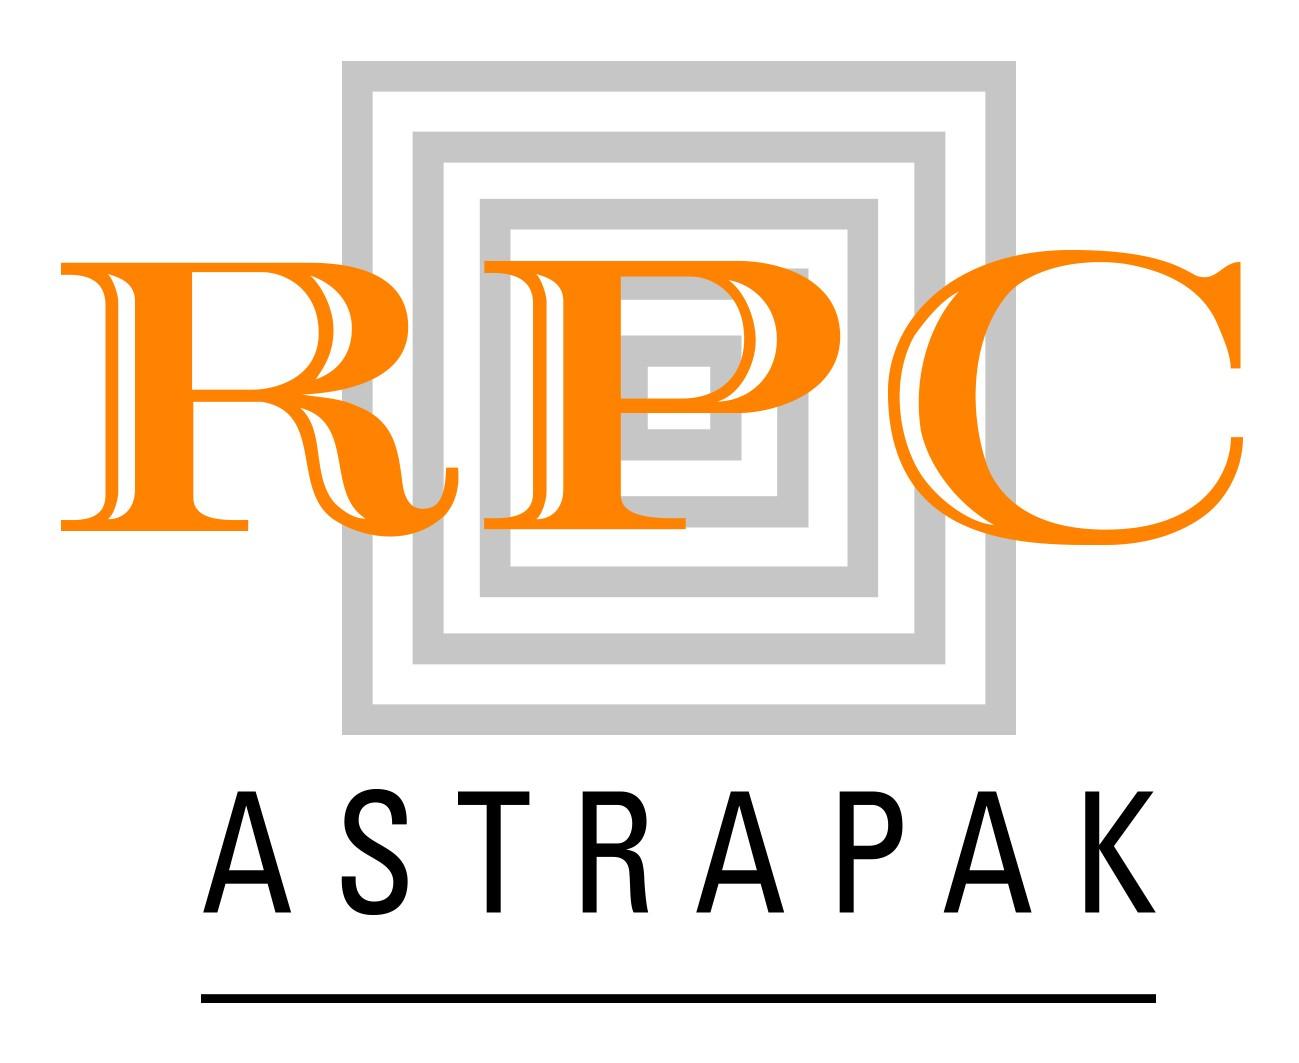 Astrapak